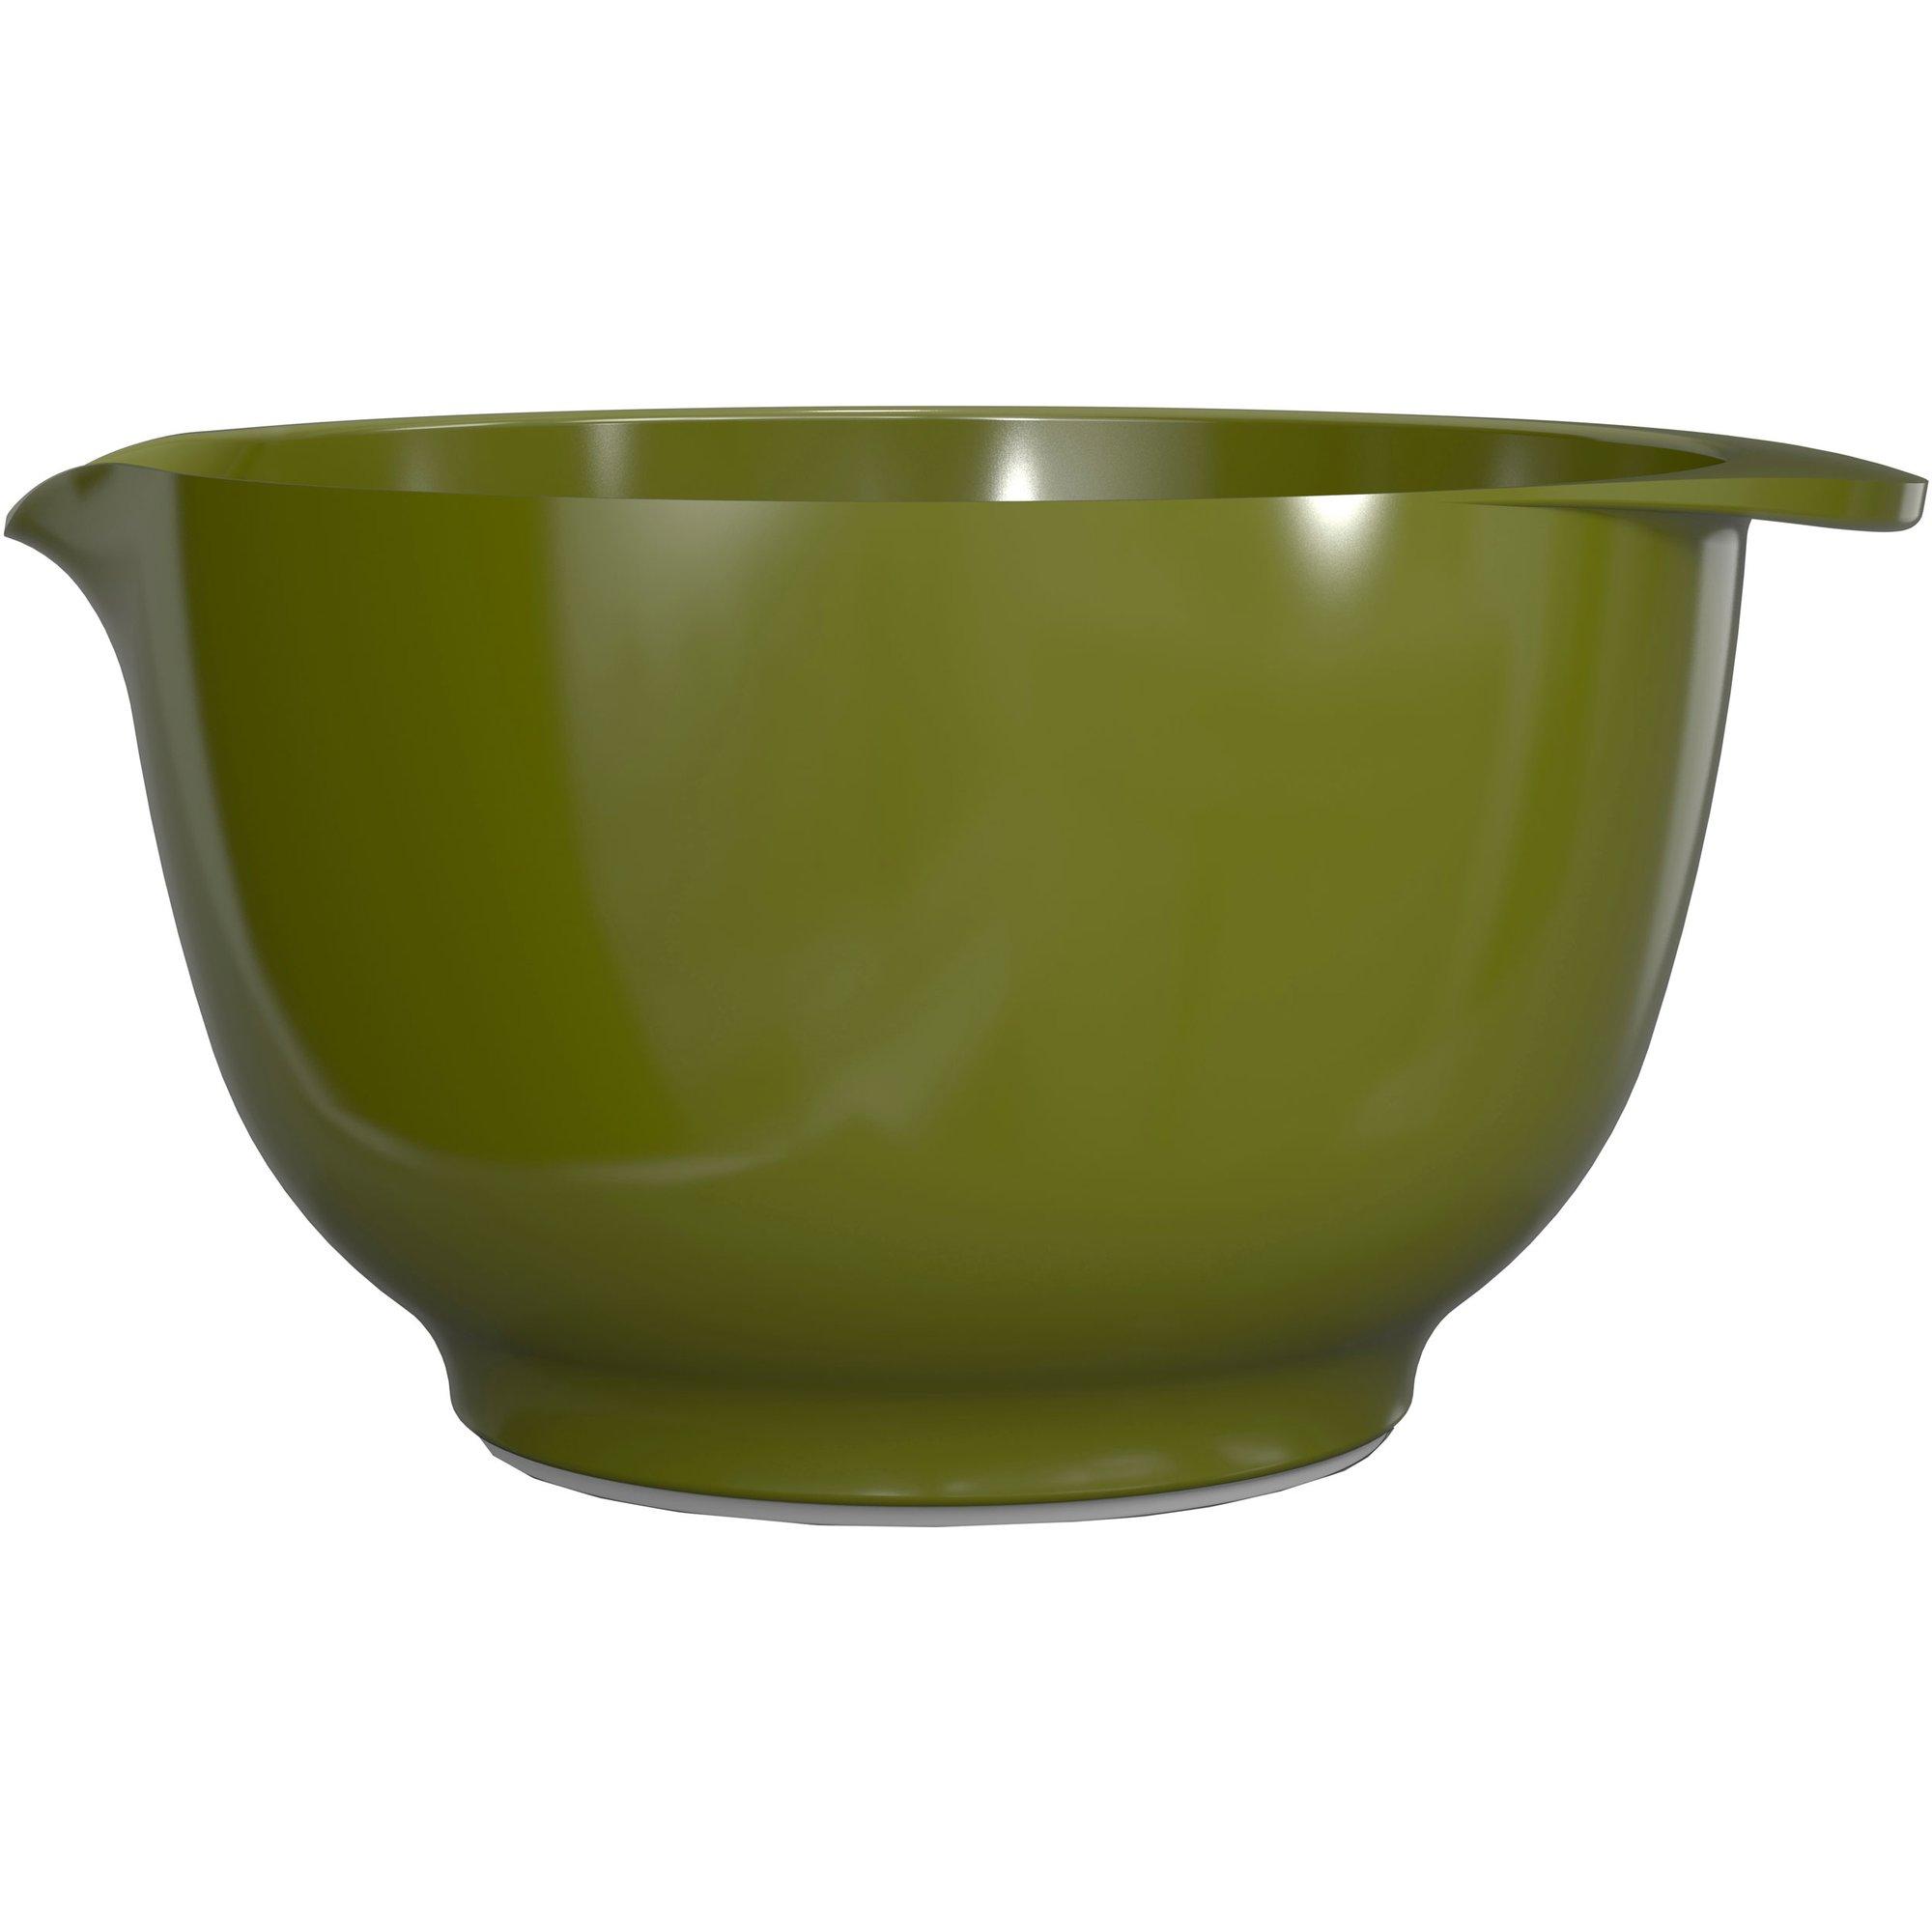 Rosti Mepal Margrethe Skål 3L Olivgrön